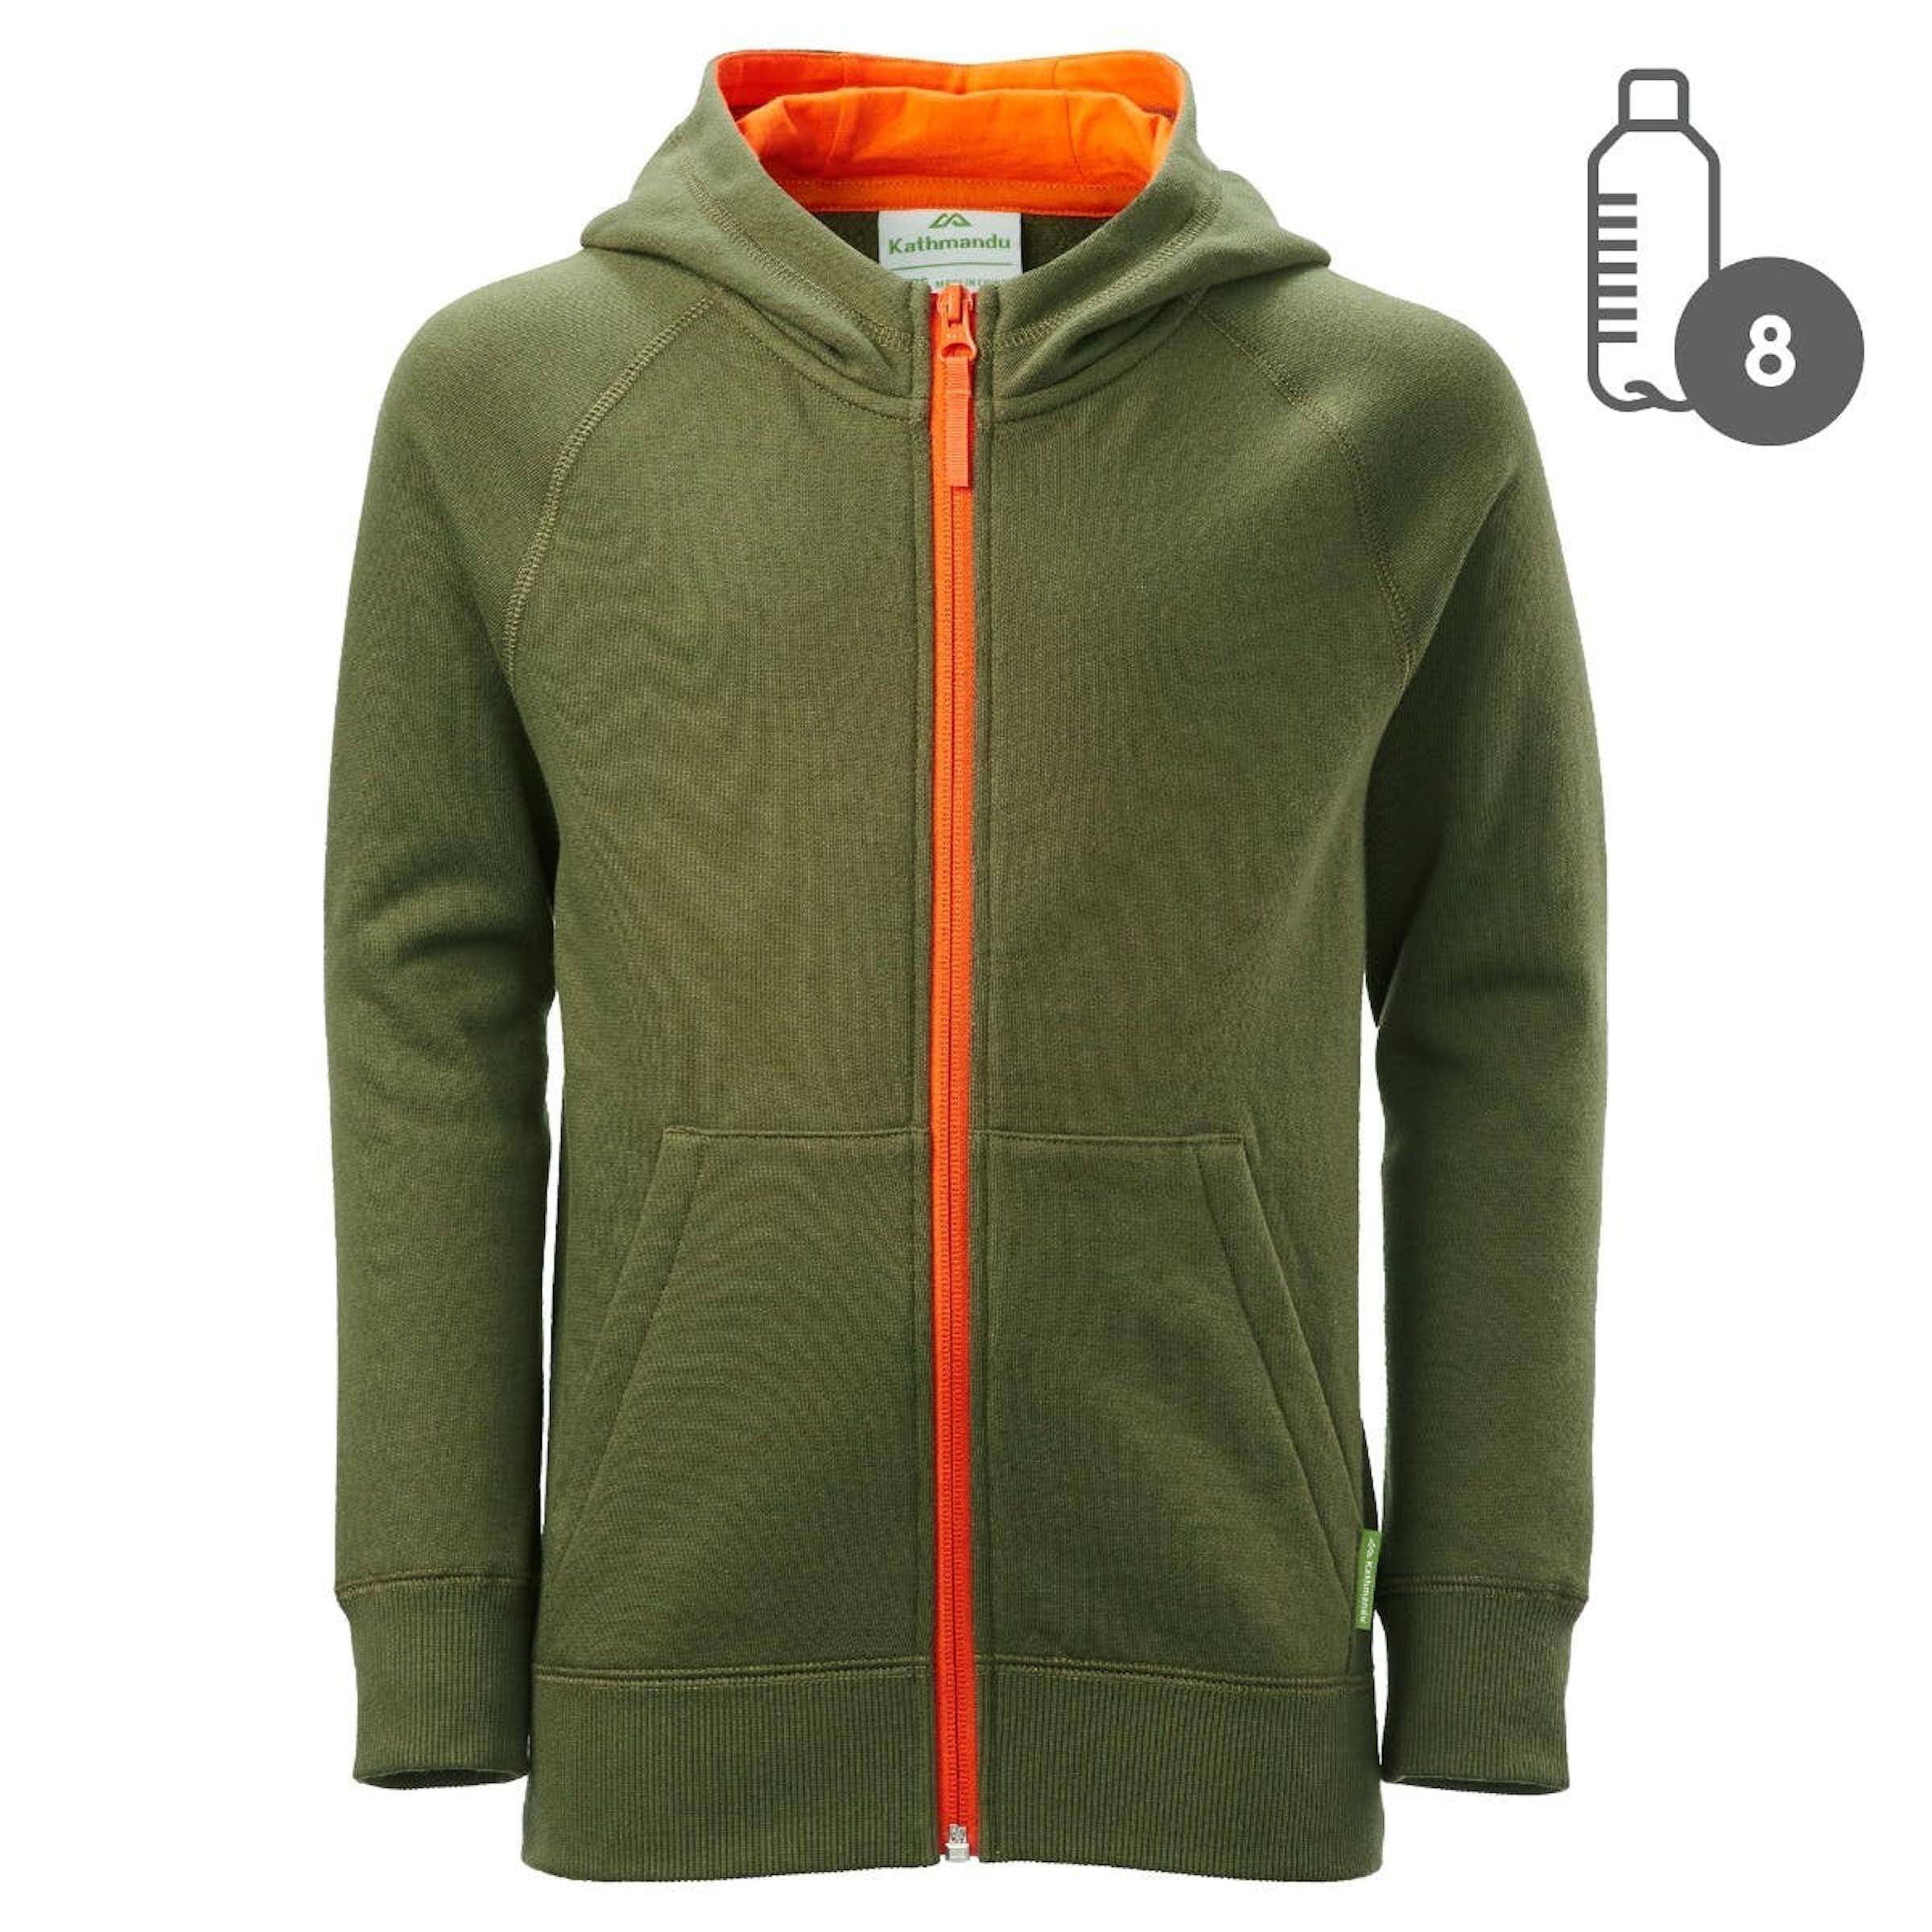 60fd01b0 KMD Youth Zip Hooded Jacket